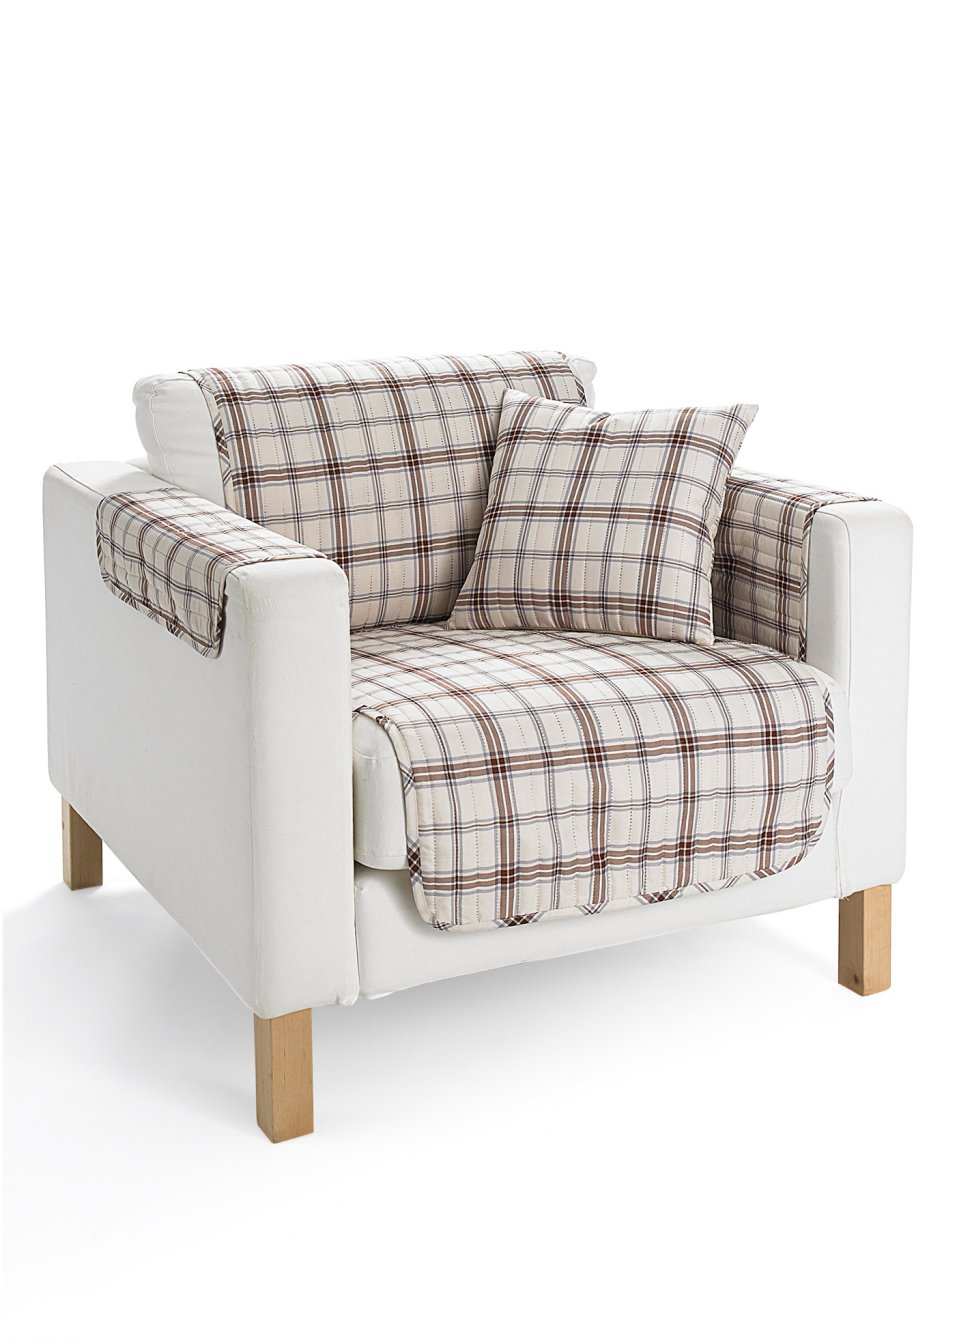 jet de fauteuil karo cr me acheter online. Black Bedroom Furniture Sets. Home Design Ideas